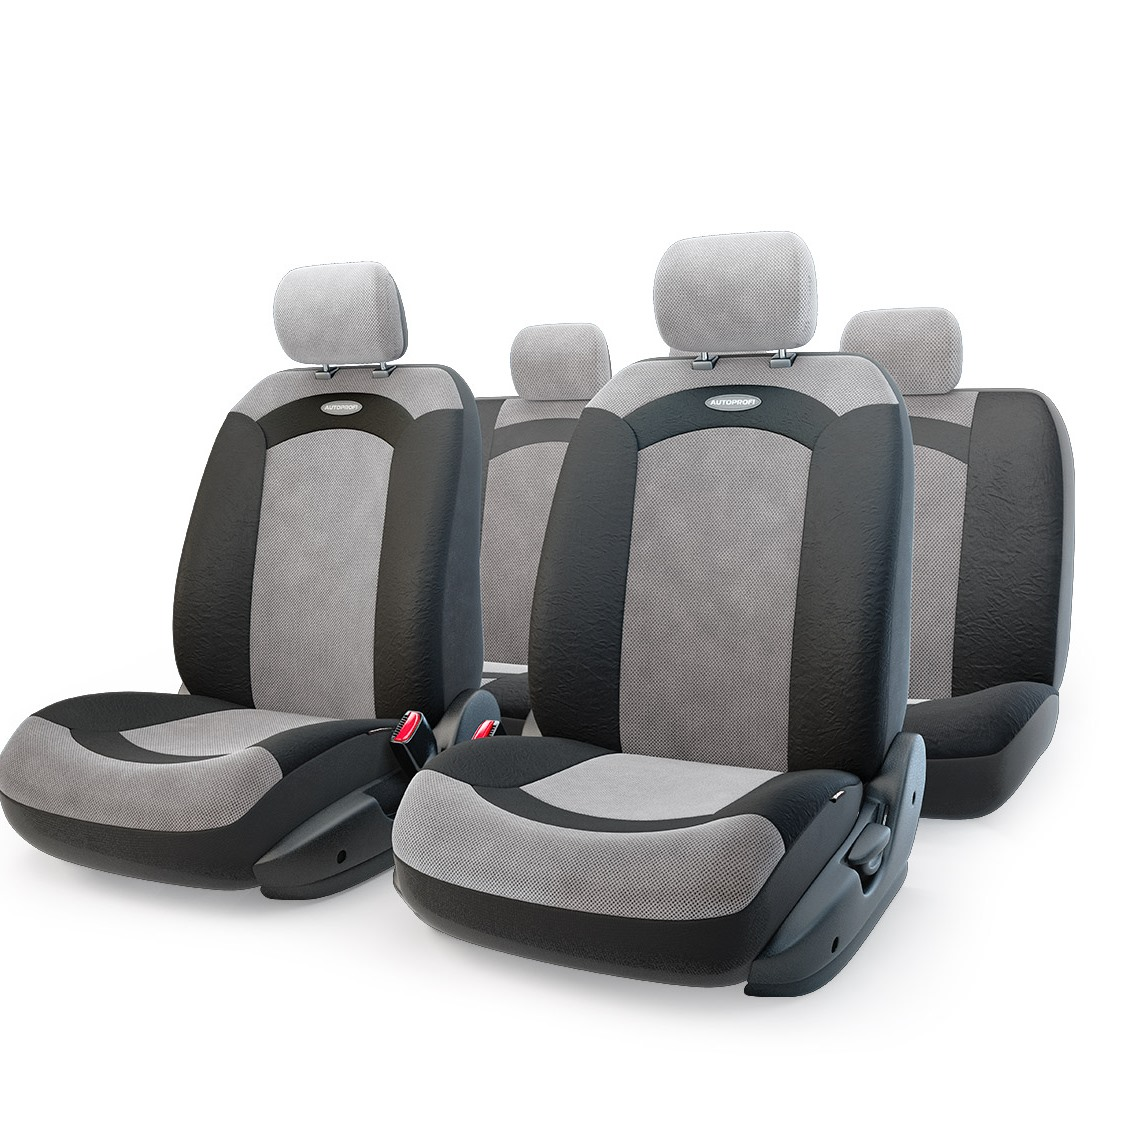 цена на Чехол на сиденье Autoprofi Xtr-803 bk/gy (m)